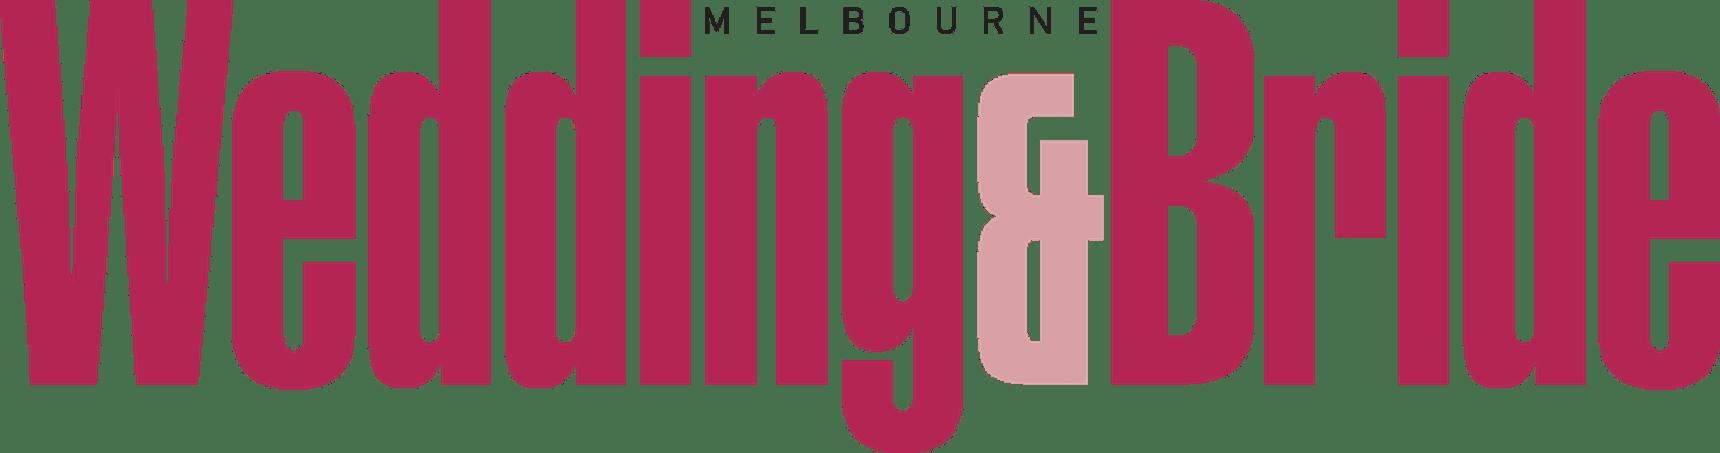 Melbourne weddings logo